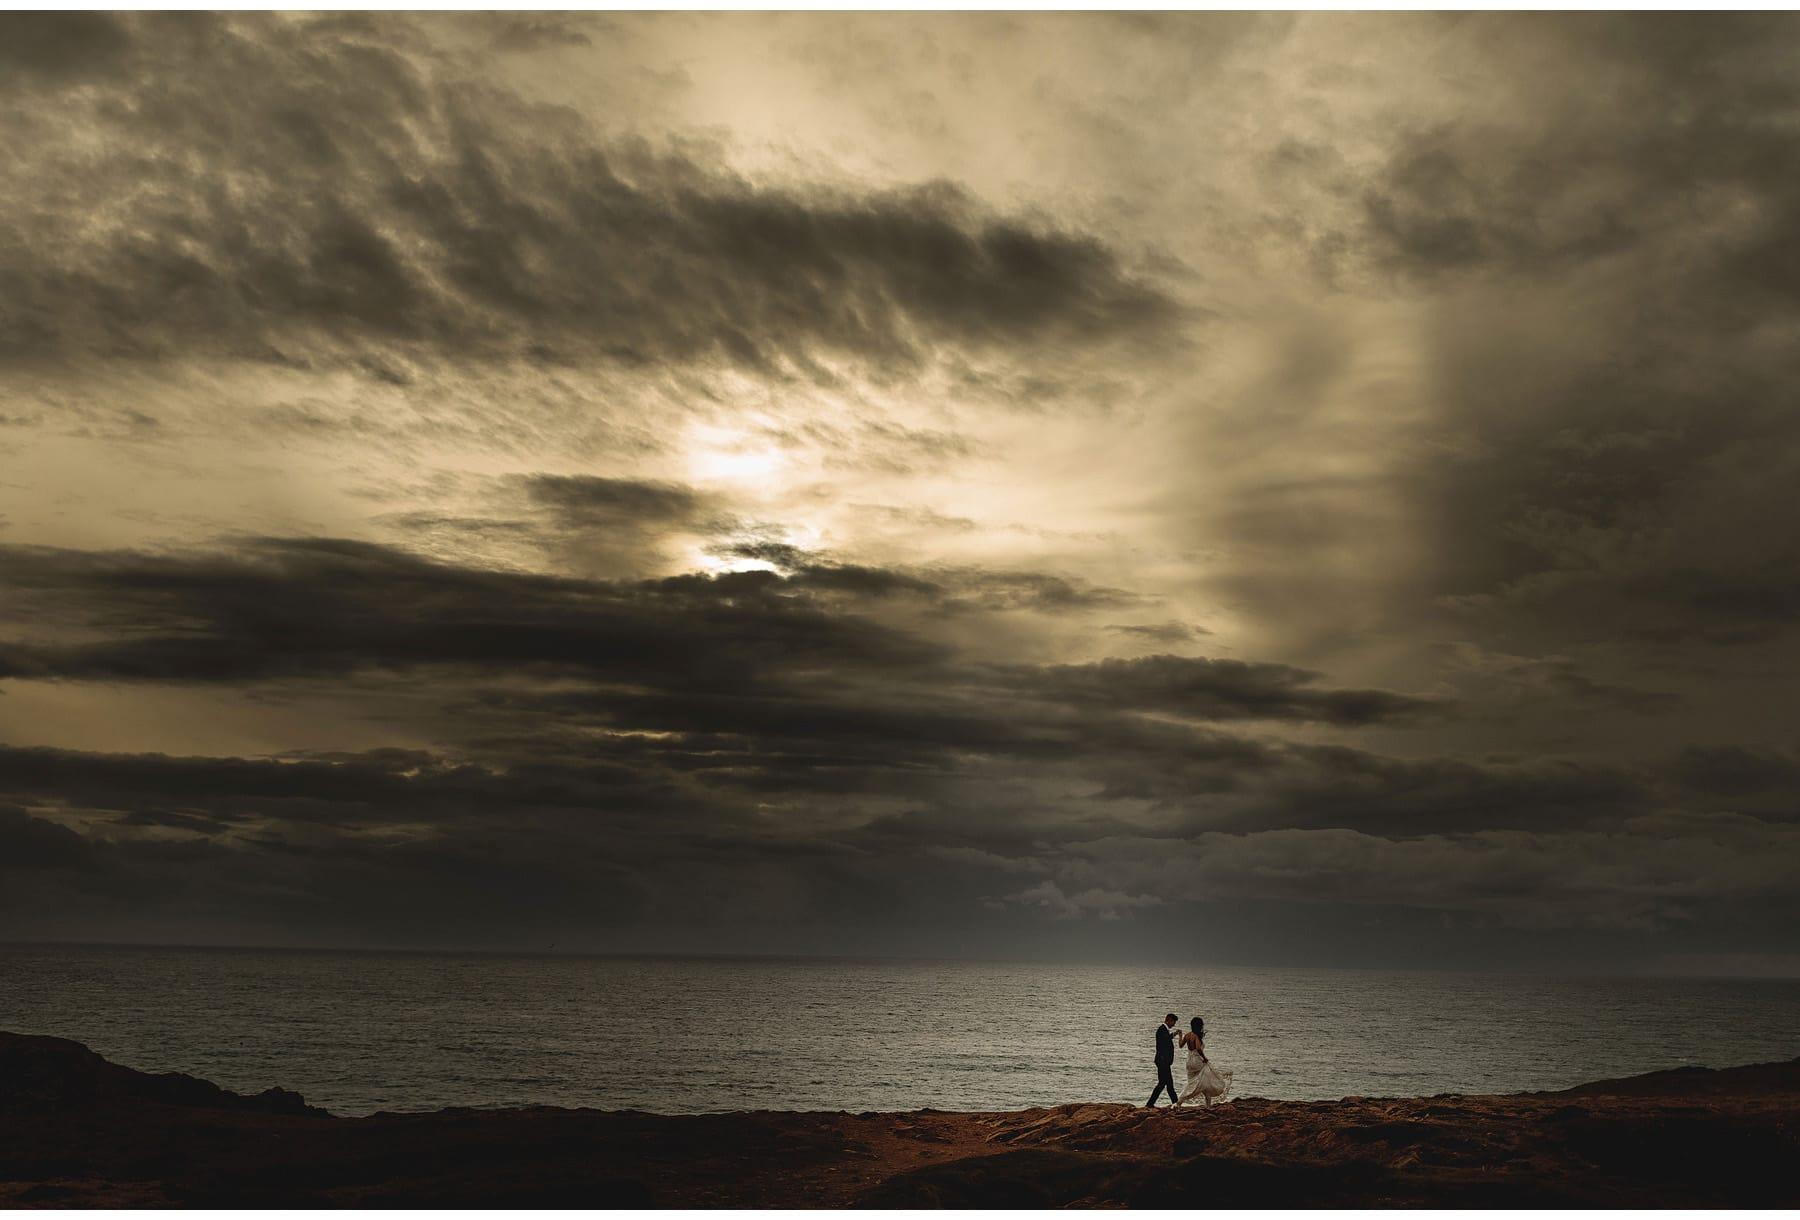 The bride & groom walking by the water